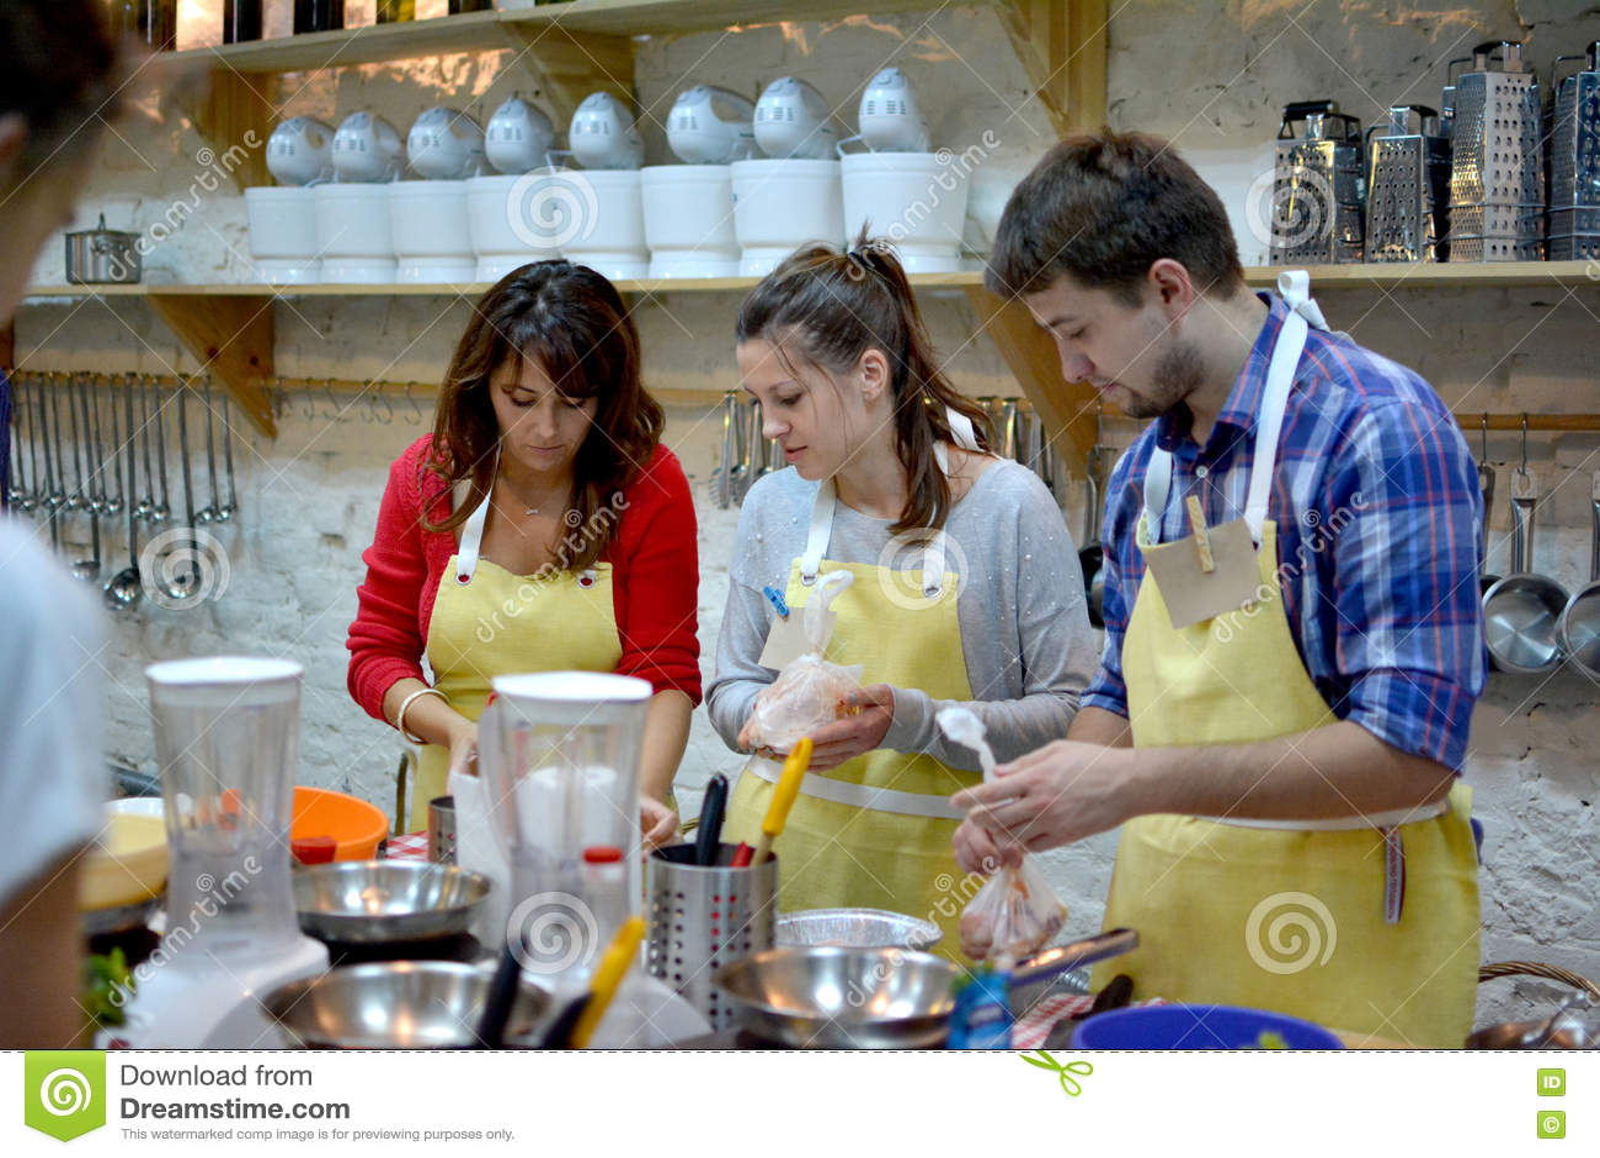 烹饪课,烹饪,食物和人概念